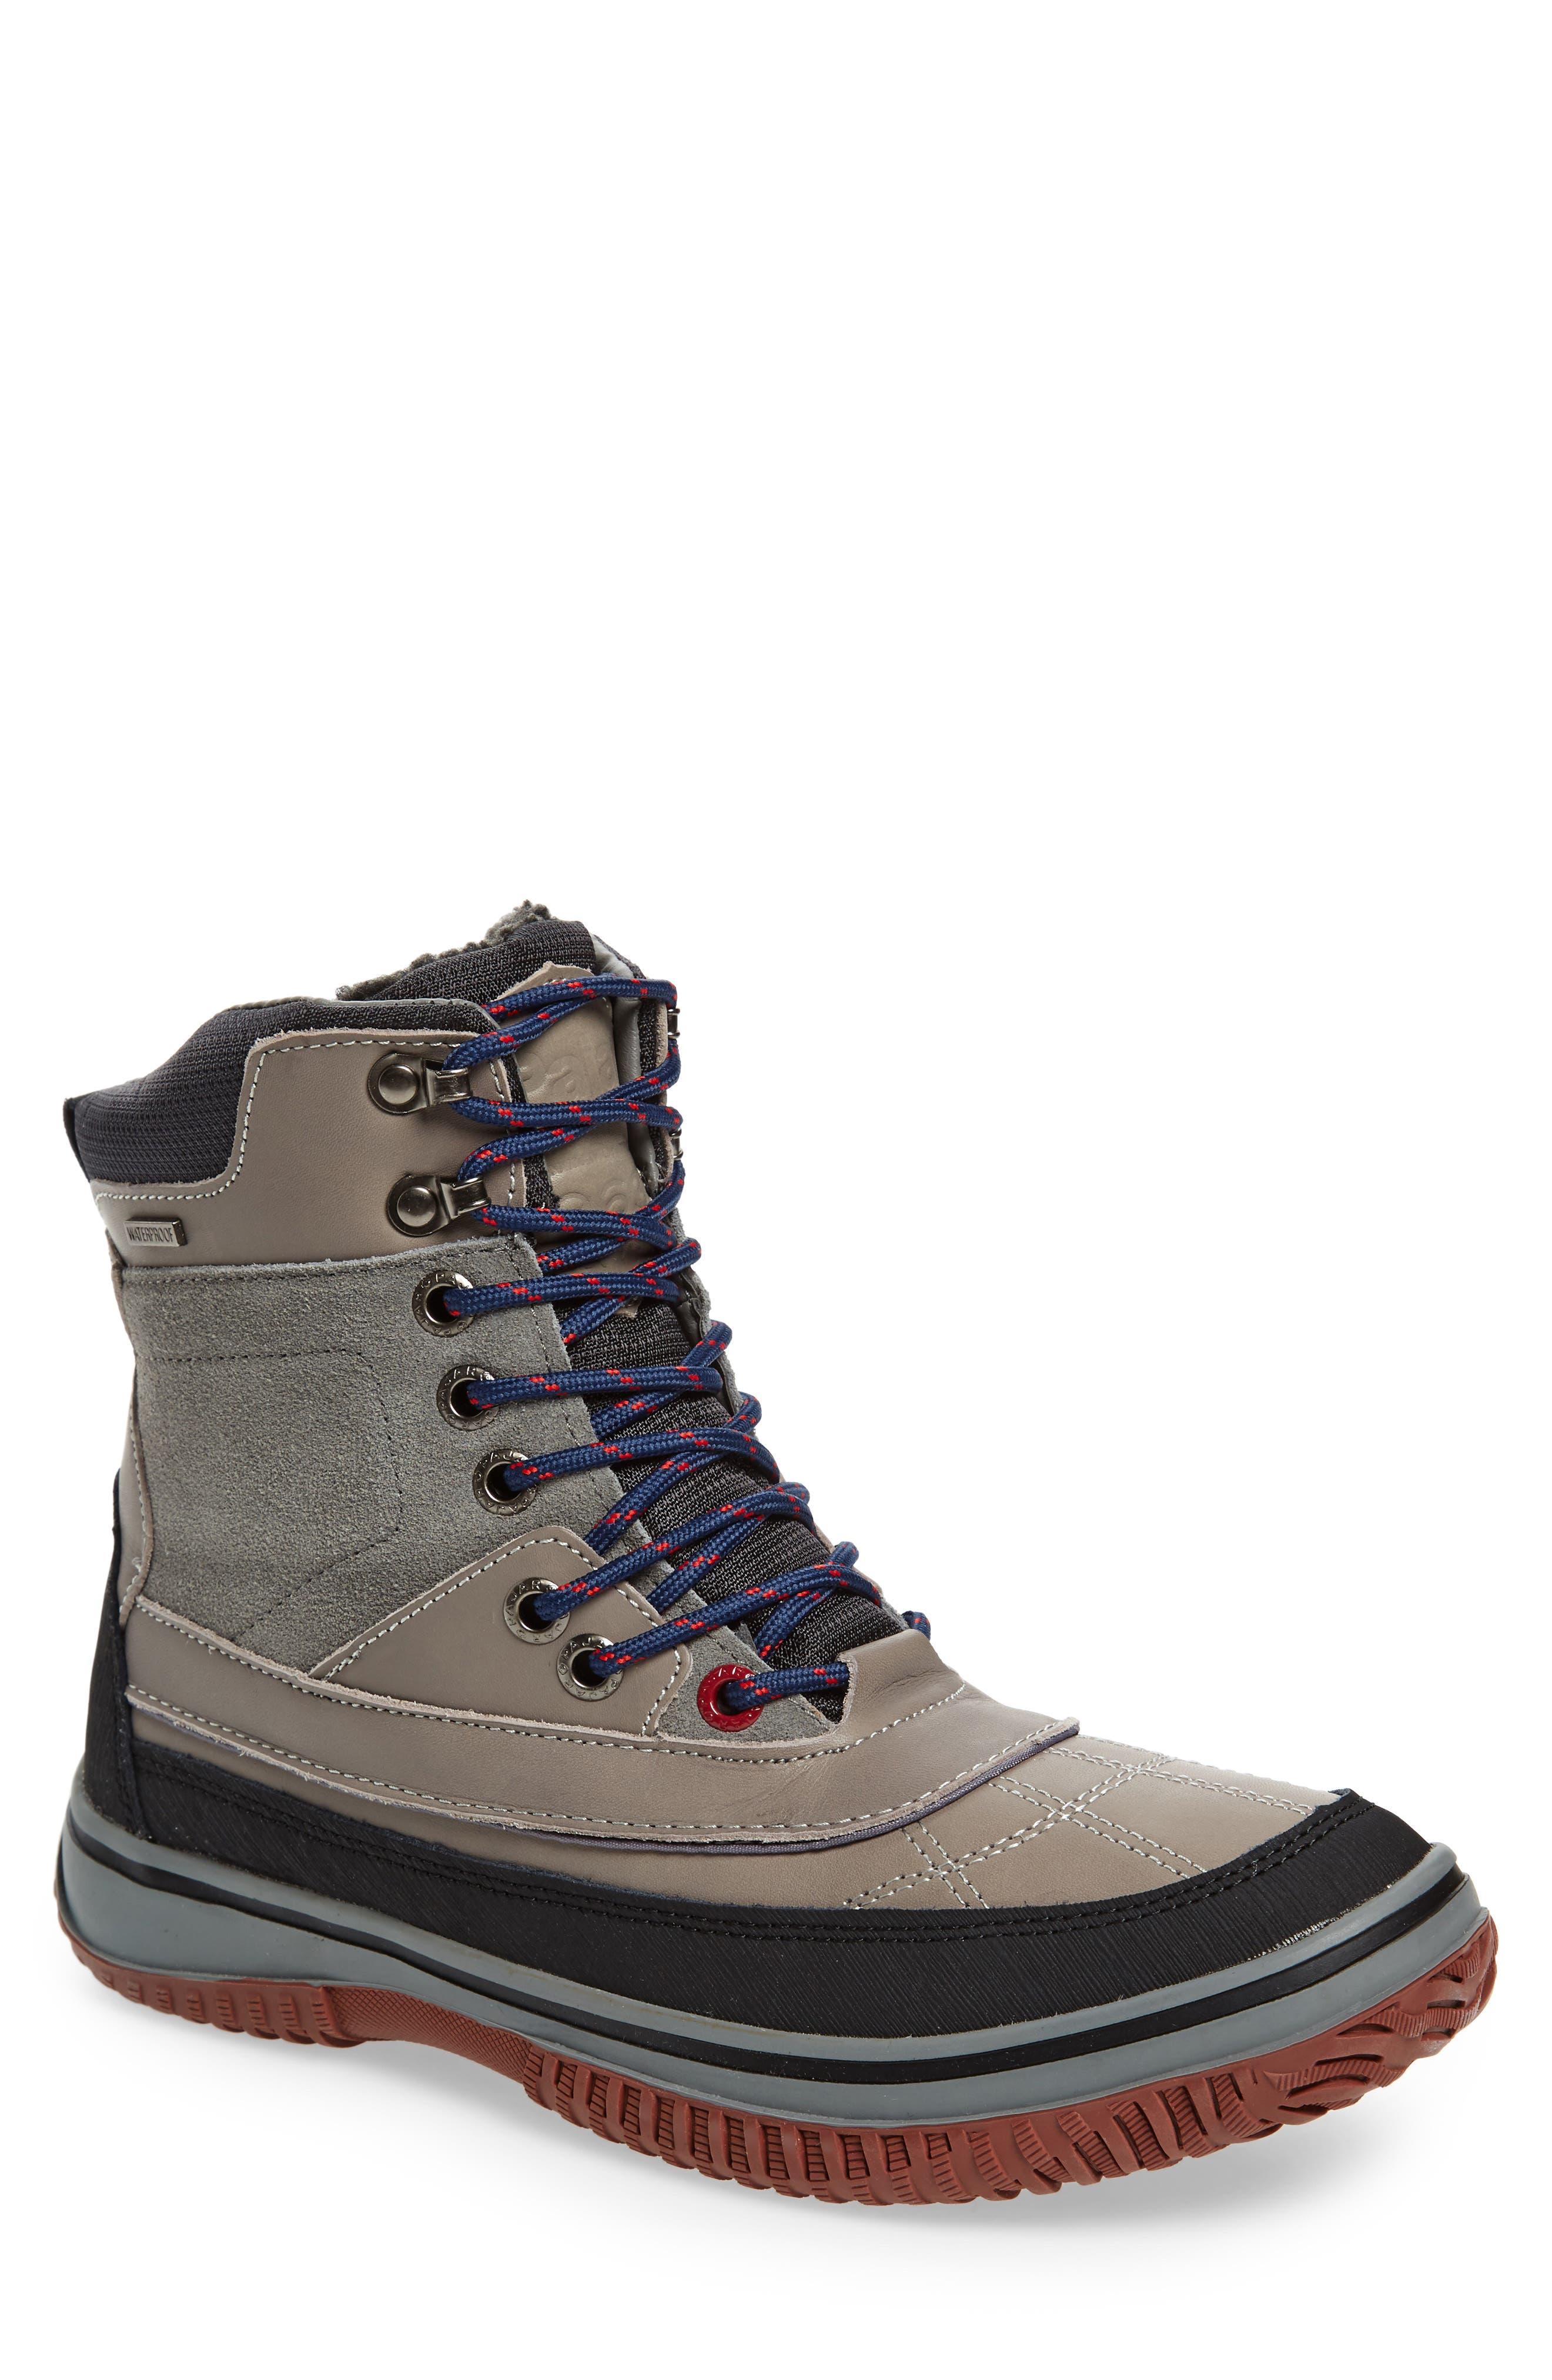 Gaspar Waterproof Winter Boot,                         Main,                         color, Grey Leather